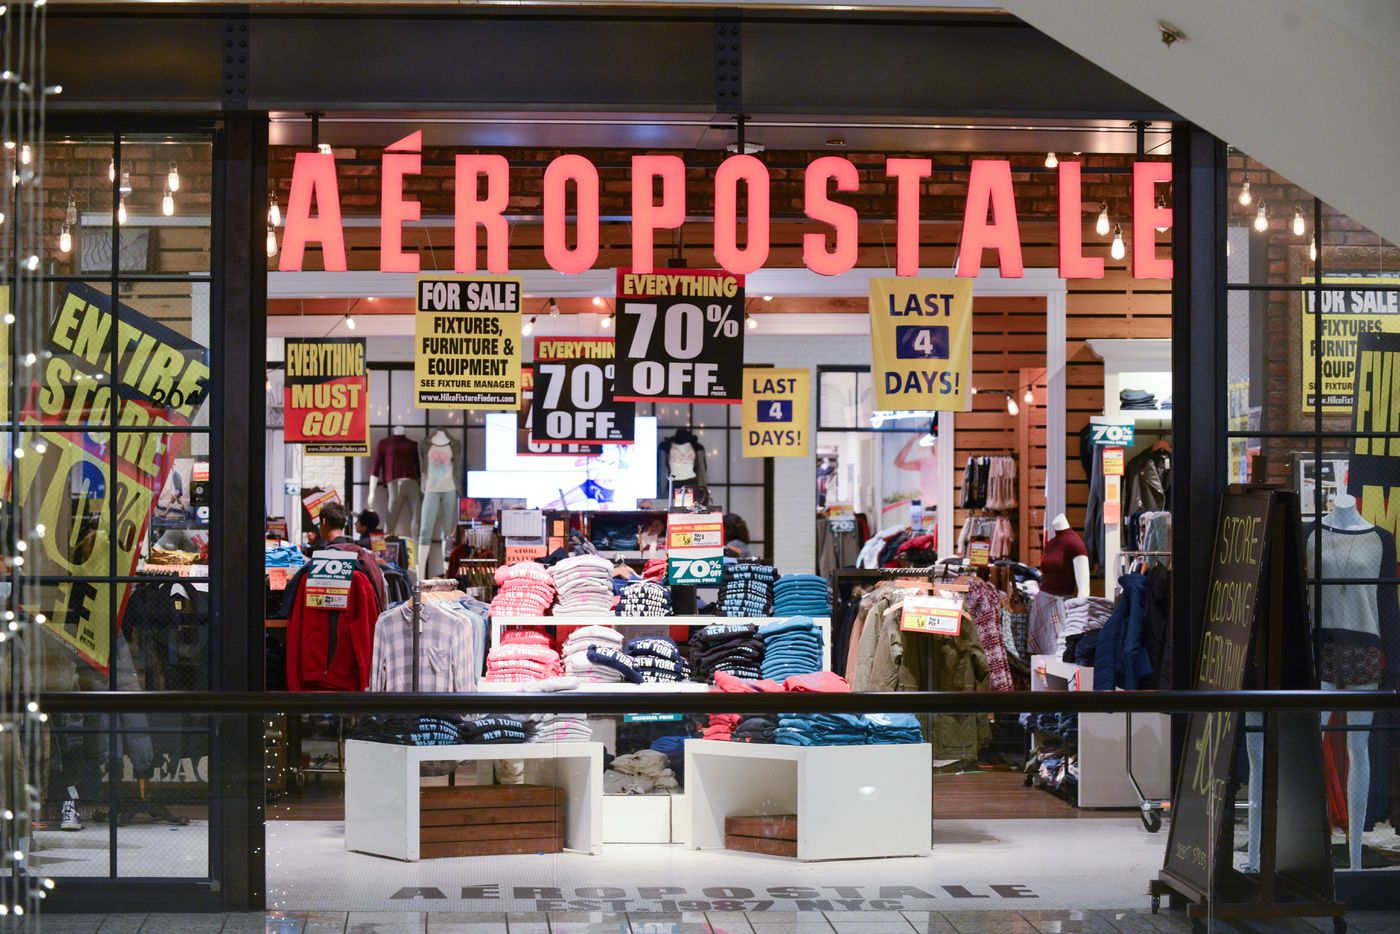 College football team apparel deals: Remember Aeropostale